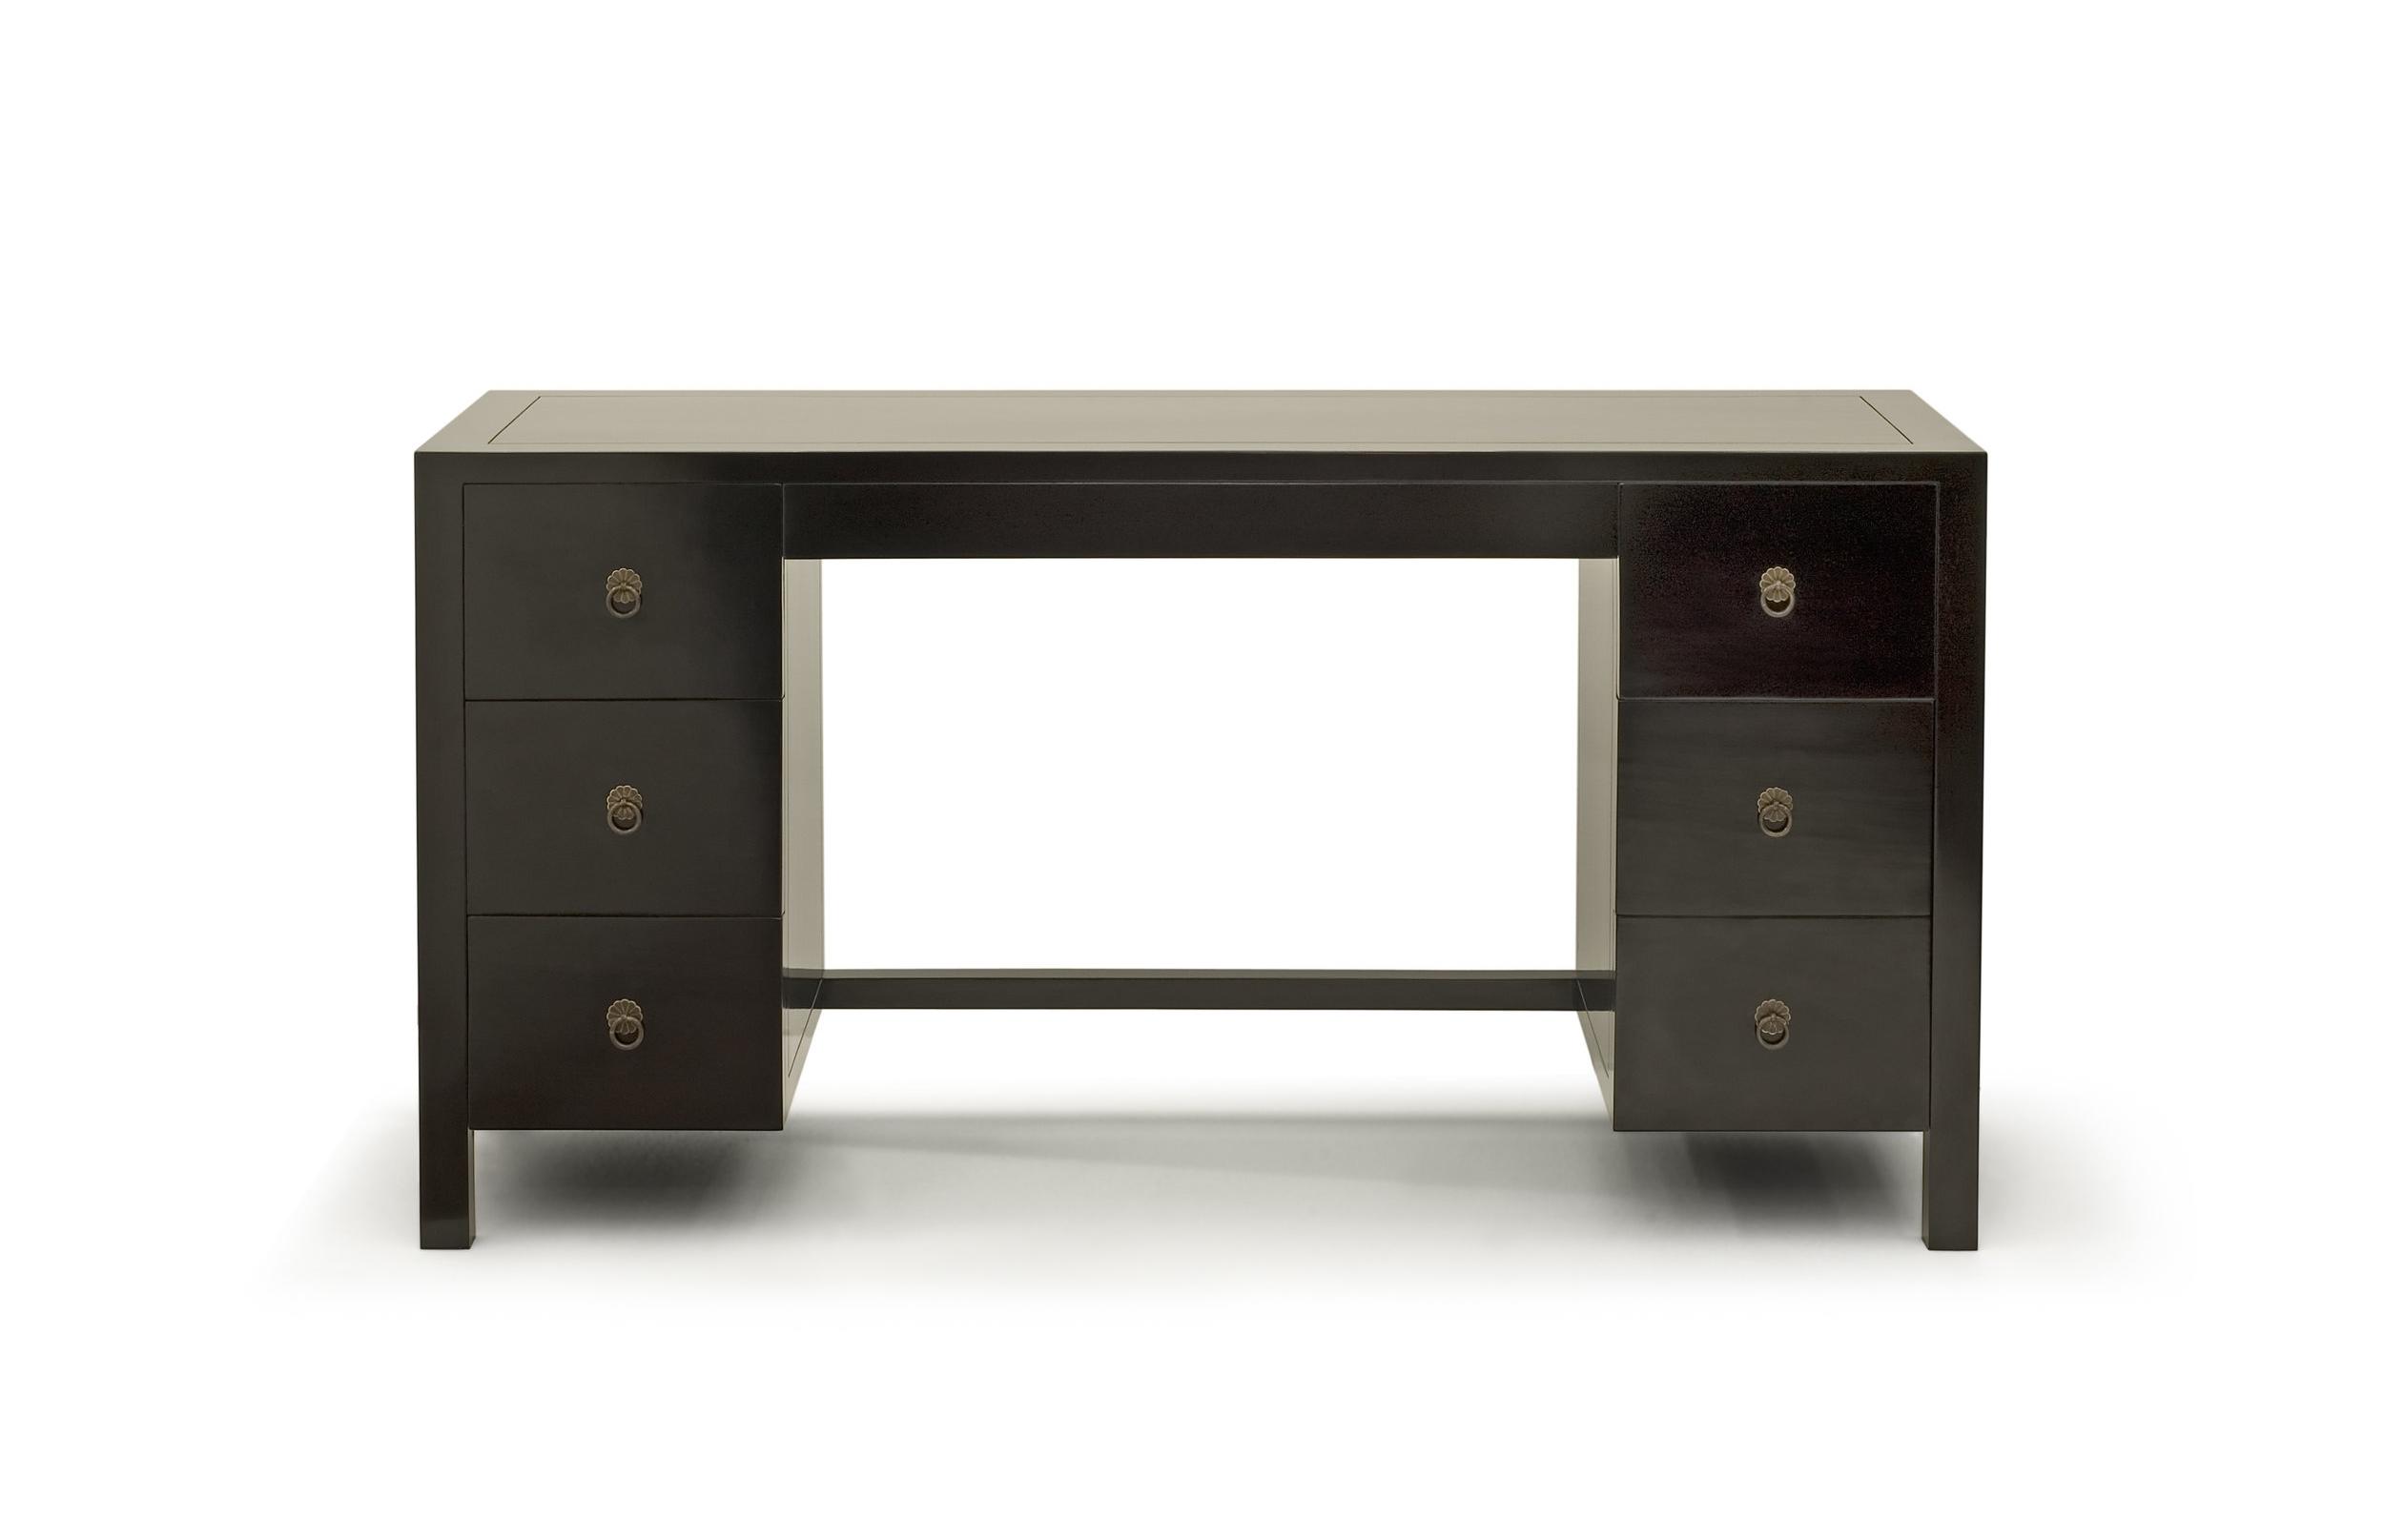 ....Bespoke Modern Chinese furniture : Dressing Table..特别定制现代中式家具: 梳妆台....